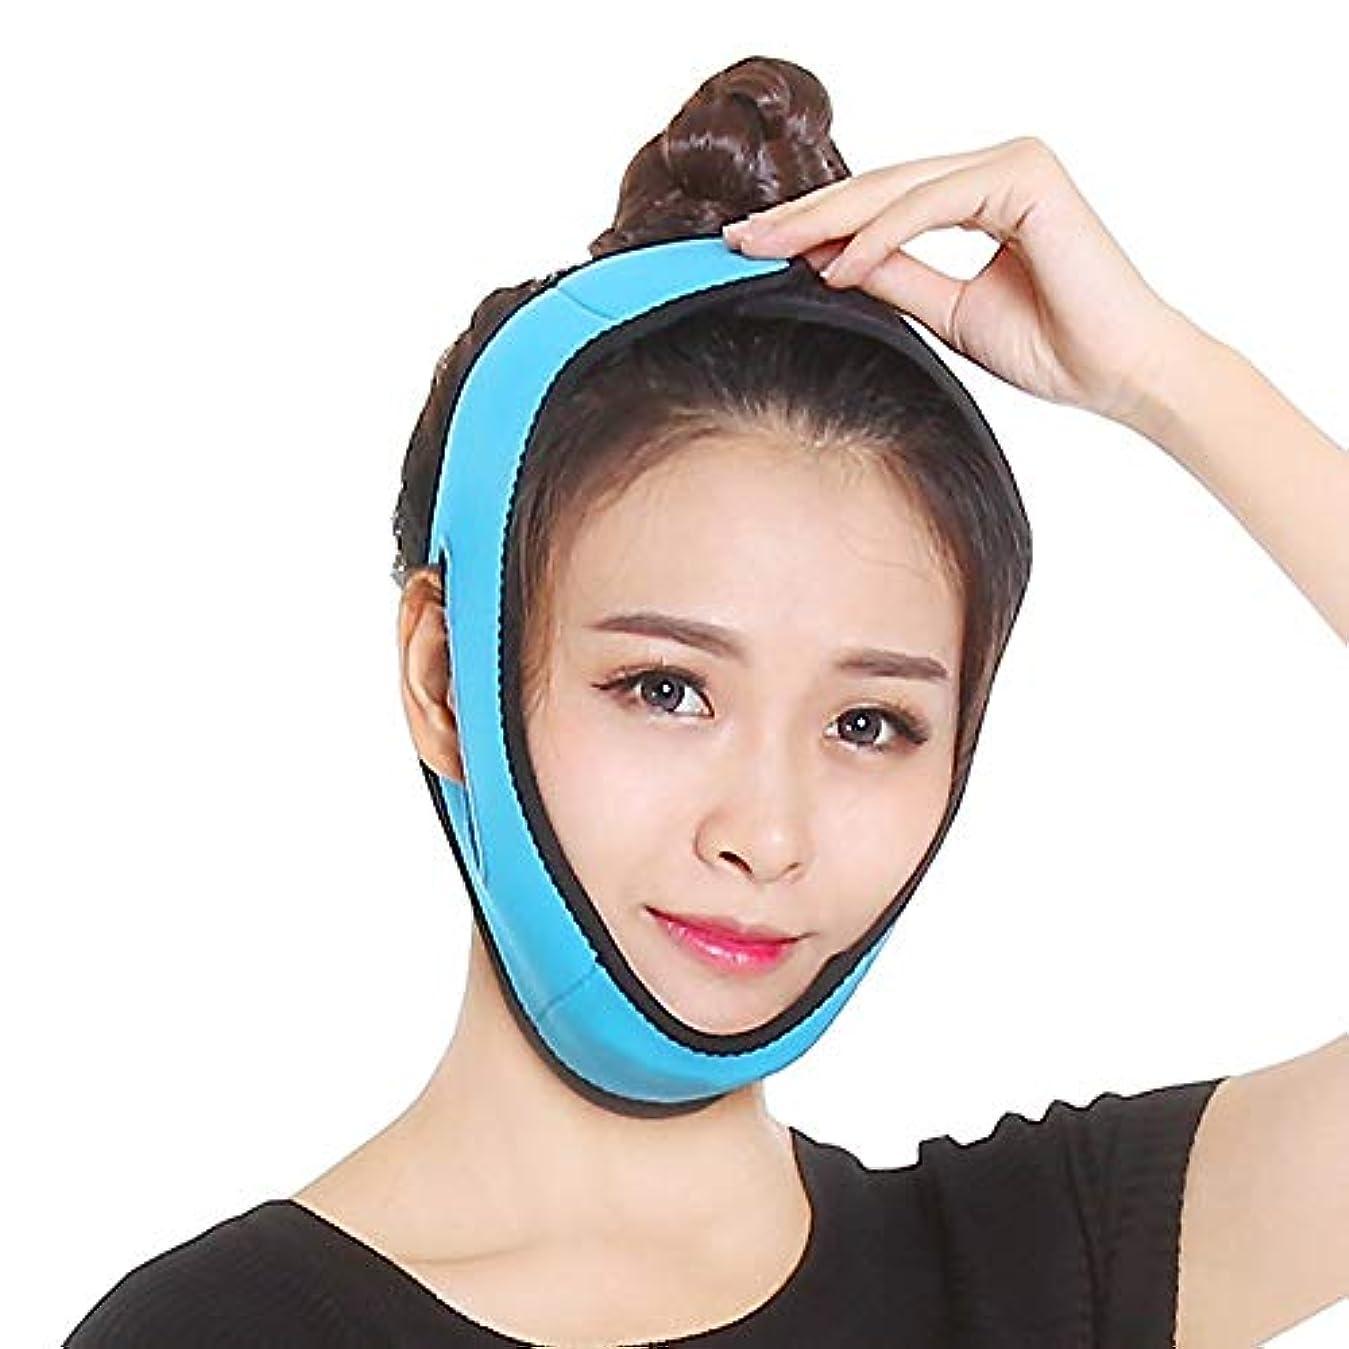 Jia Jia- フェイシャルリフティングスリミングベルト - 薄いフェイス包帯二重あごデバイス無料フェイシャルマッサージ整形マスクを引き締める顔と首の顔スリム 顔面包帯